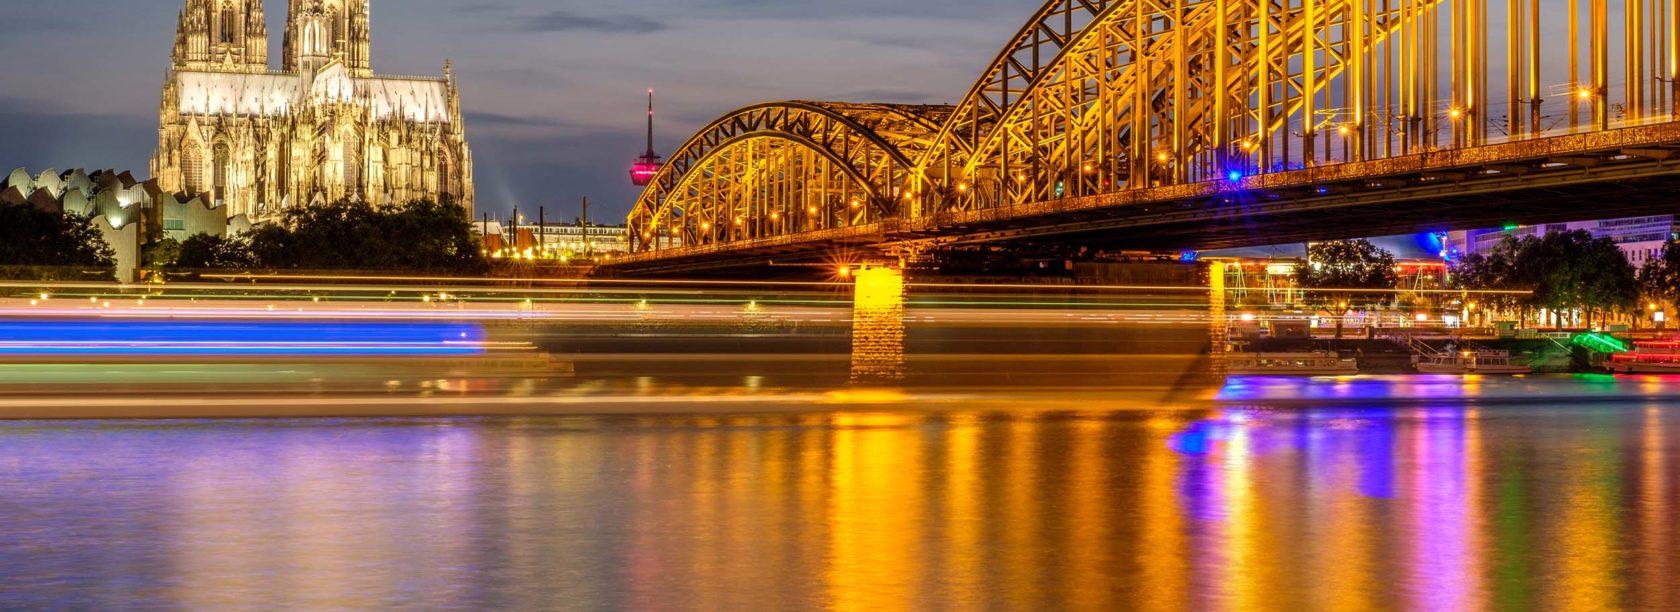 Corona-Soforthilfe in Nordrhein-Westfalen